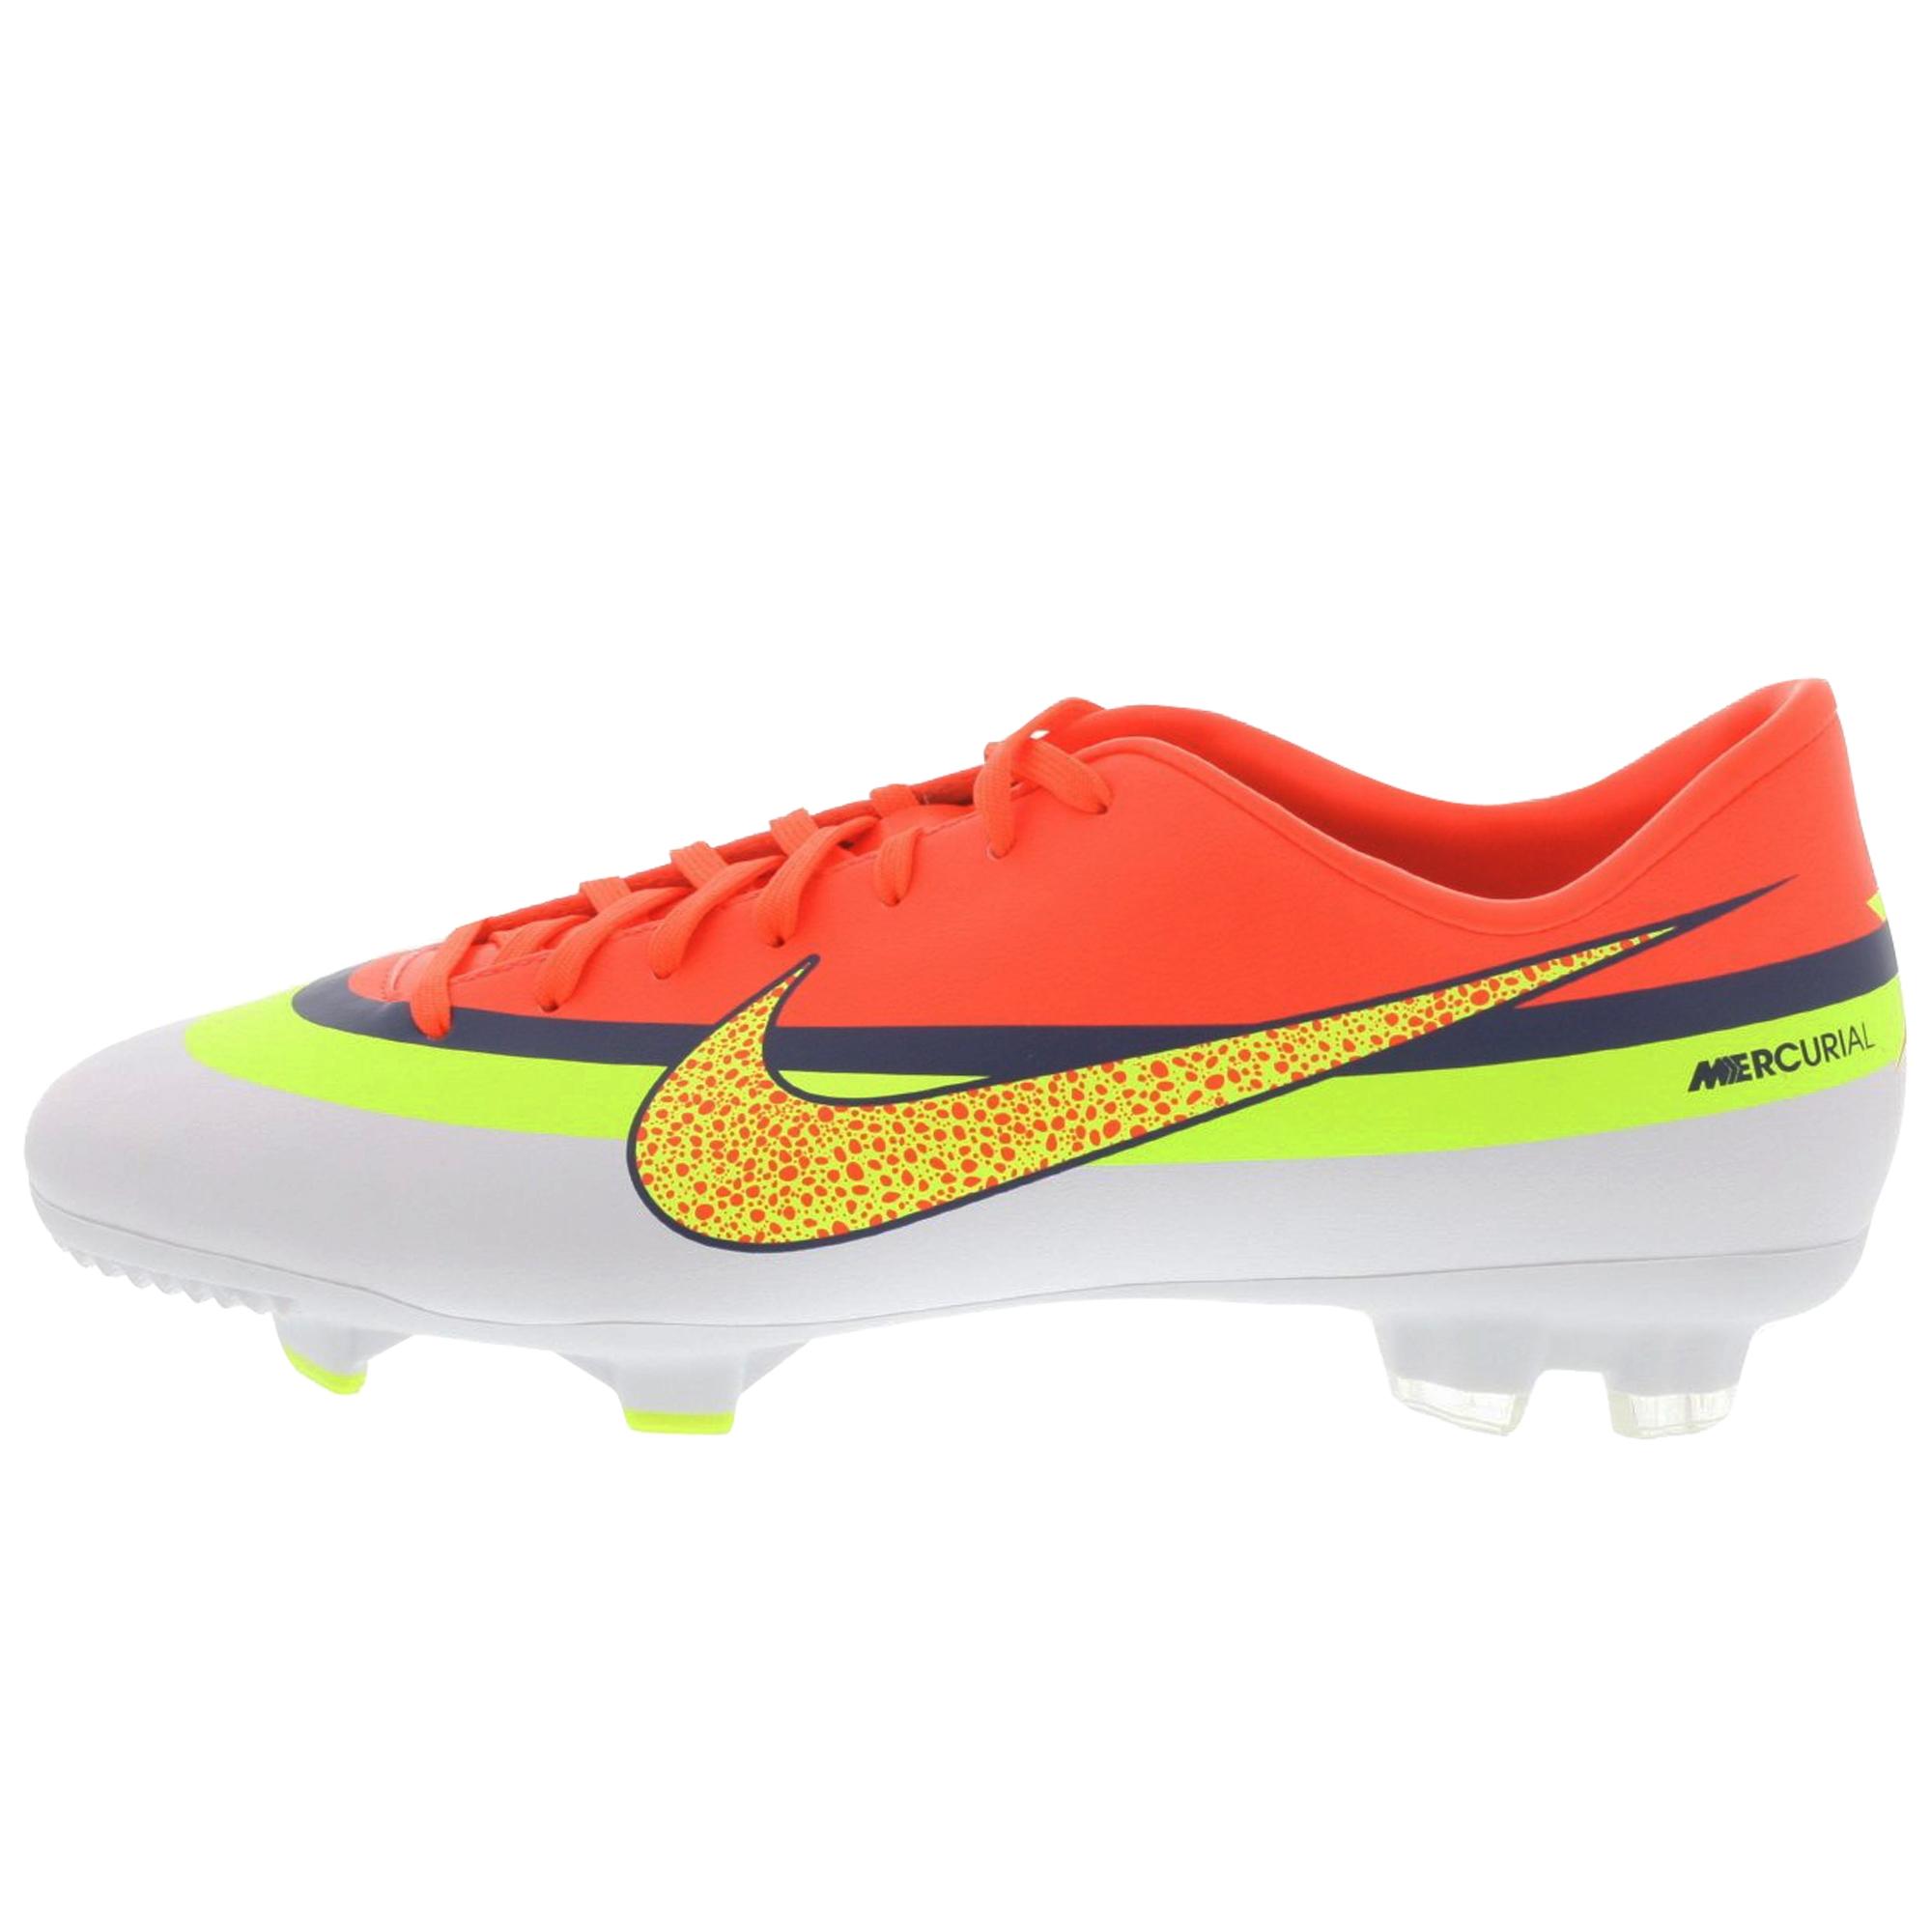 sale retailer 3cc47 9c981 ... Nike Mercurial Victory IV Fg (Cristiano Ronaldo) Krampon